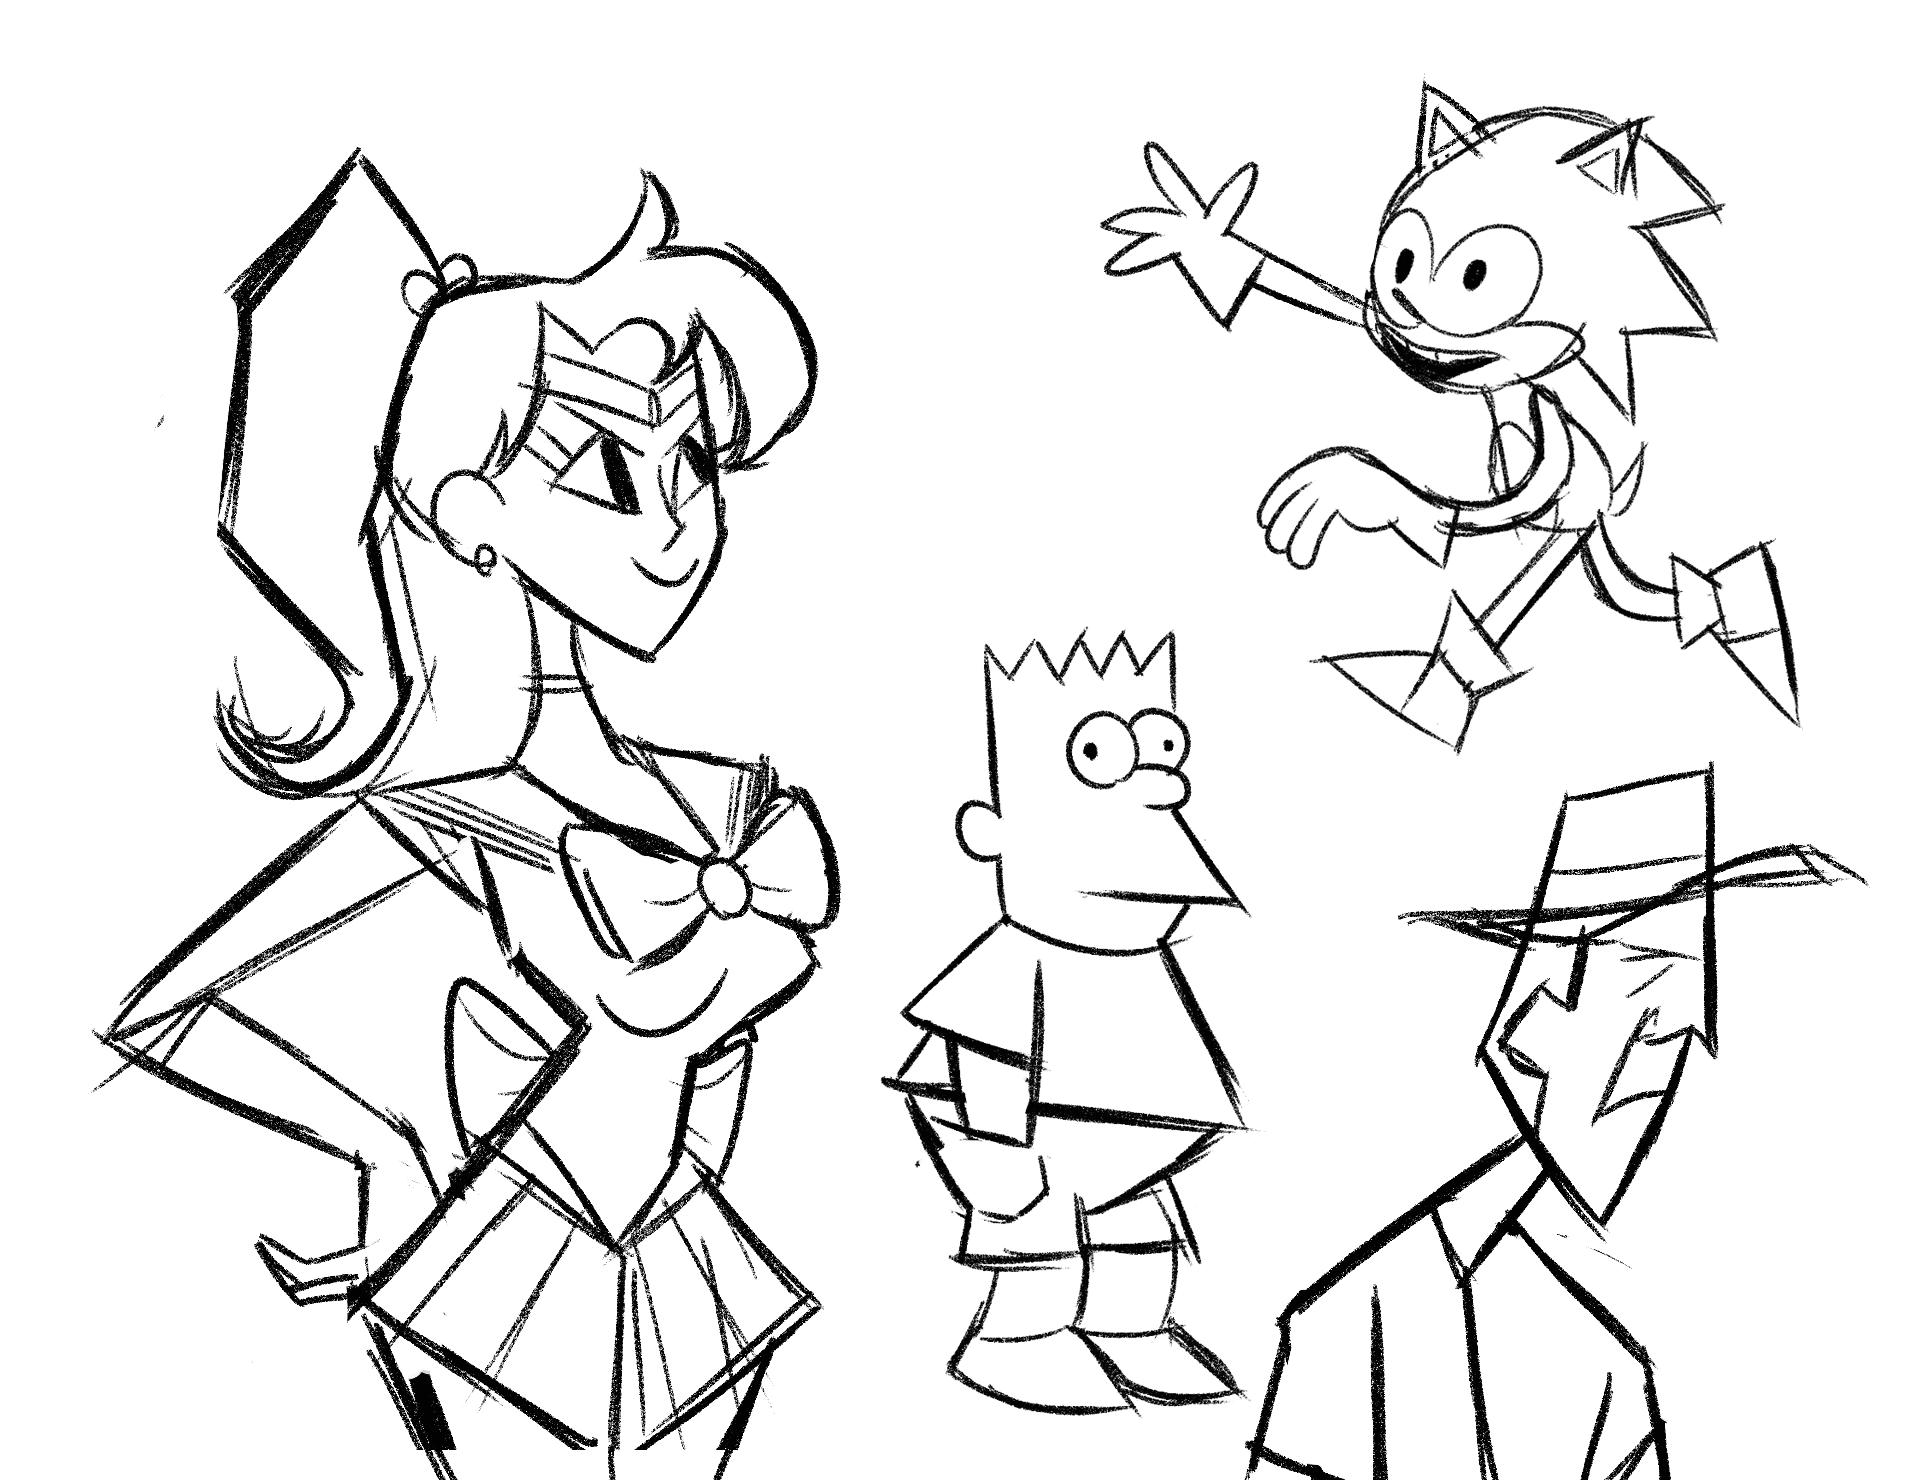 weird sketches